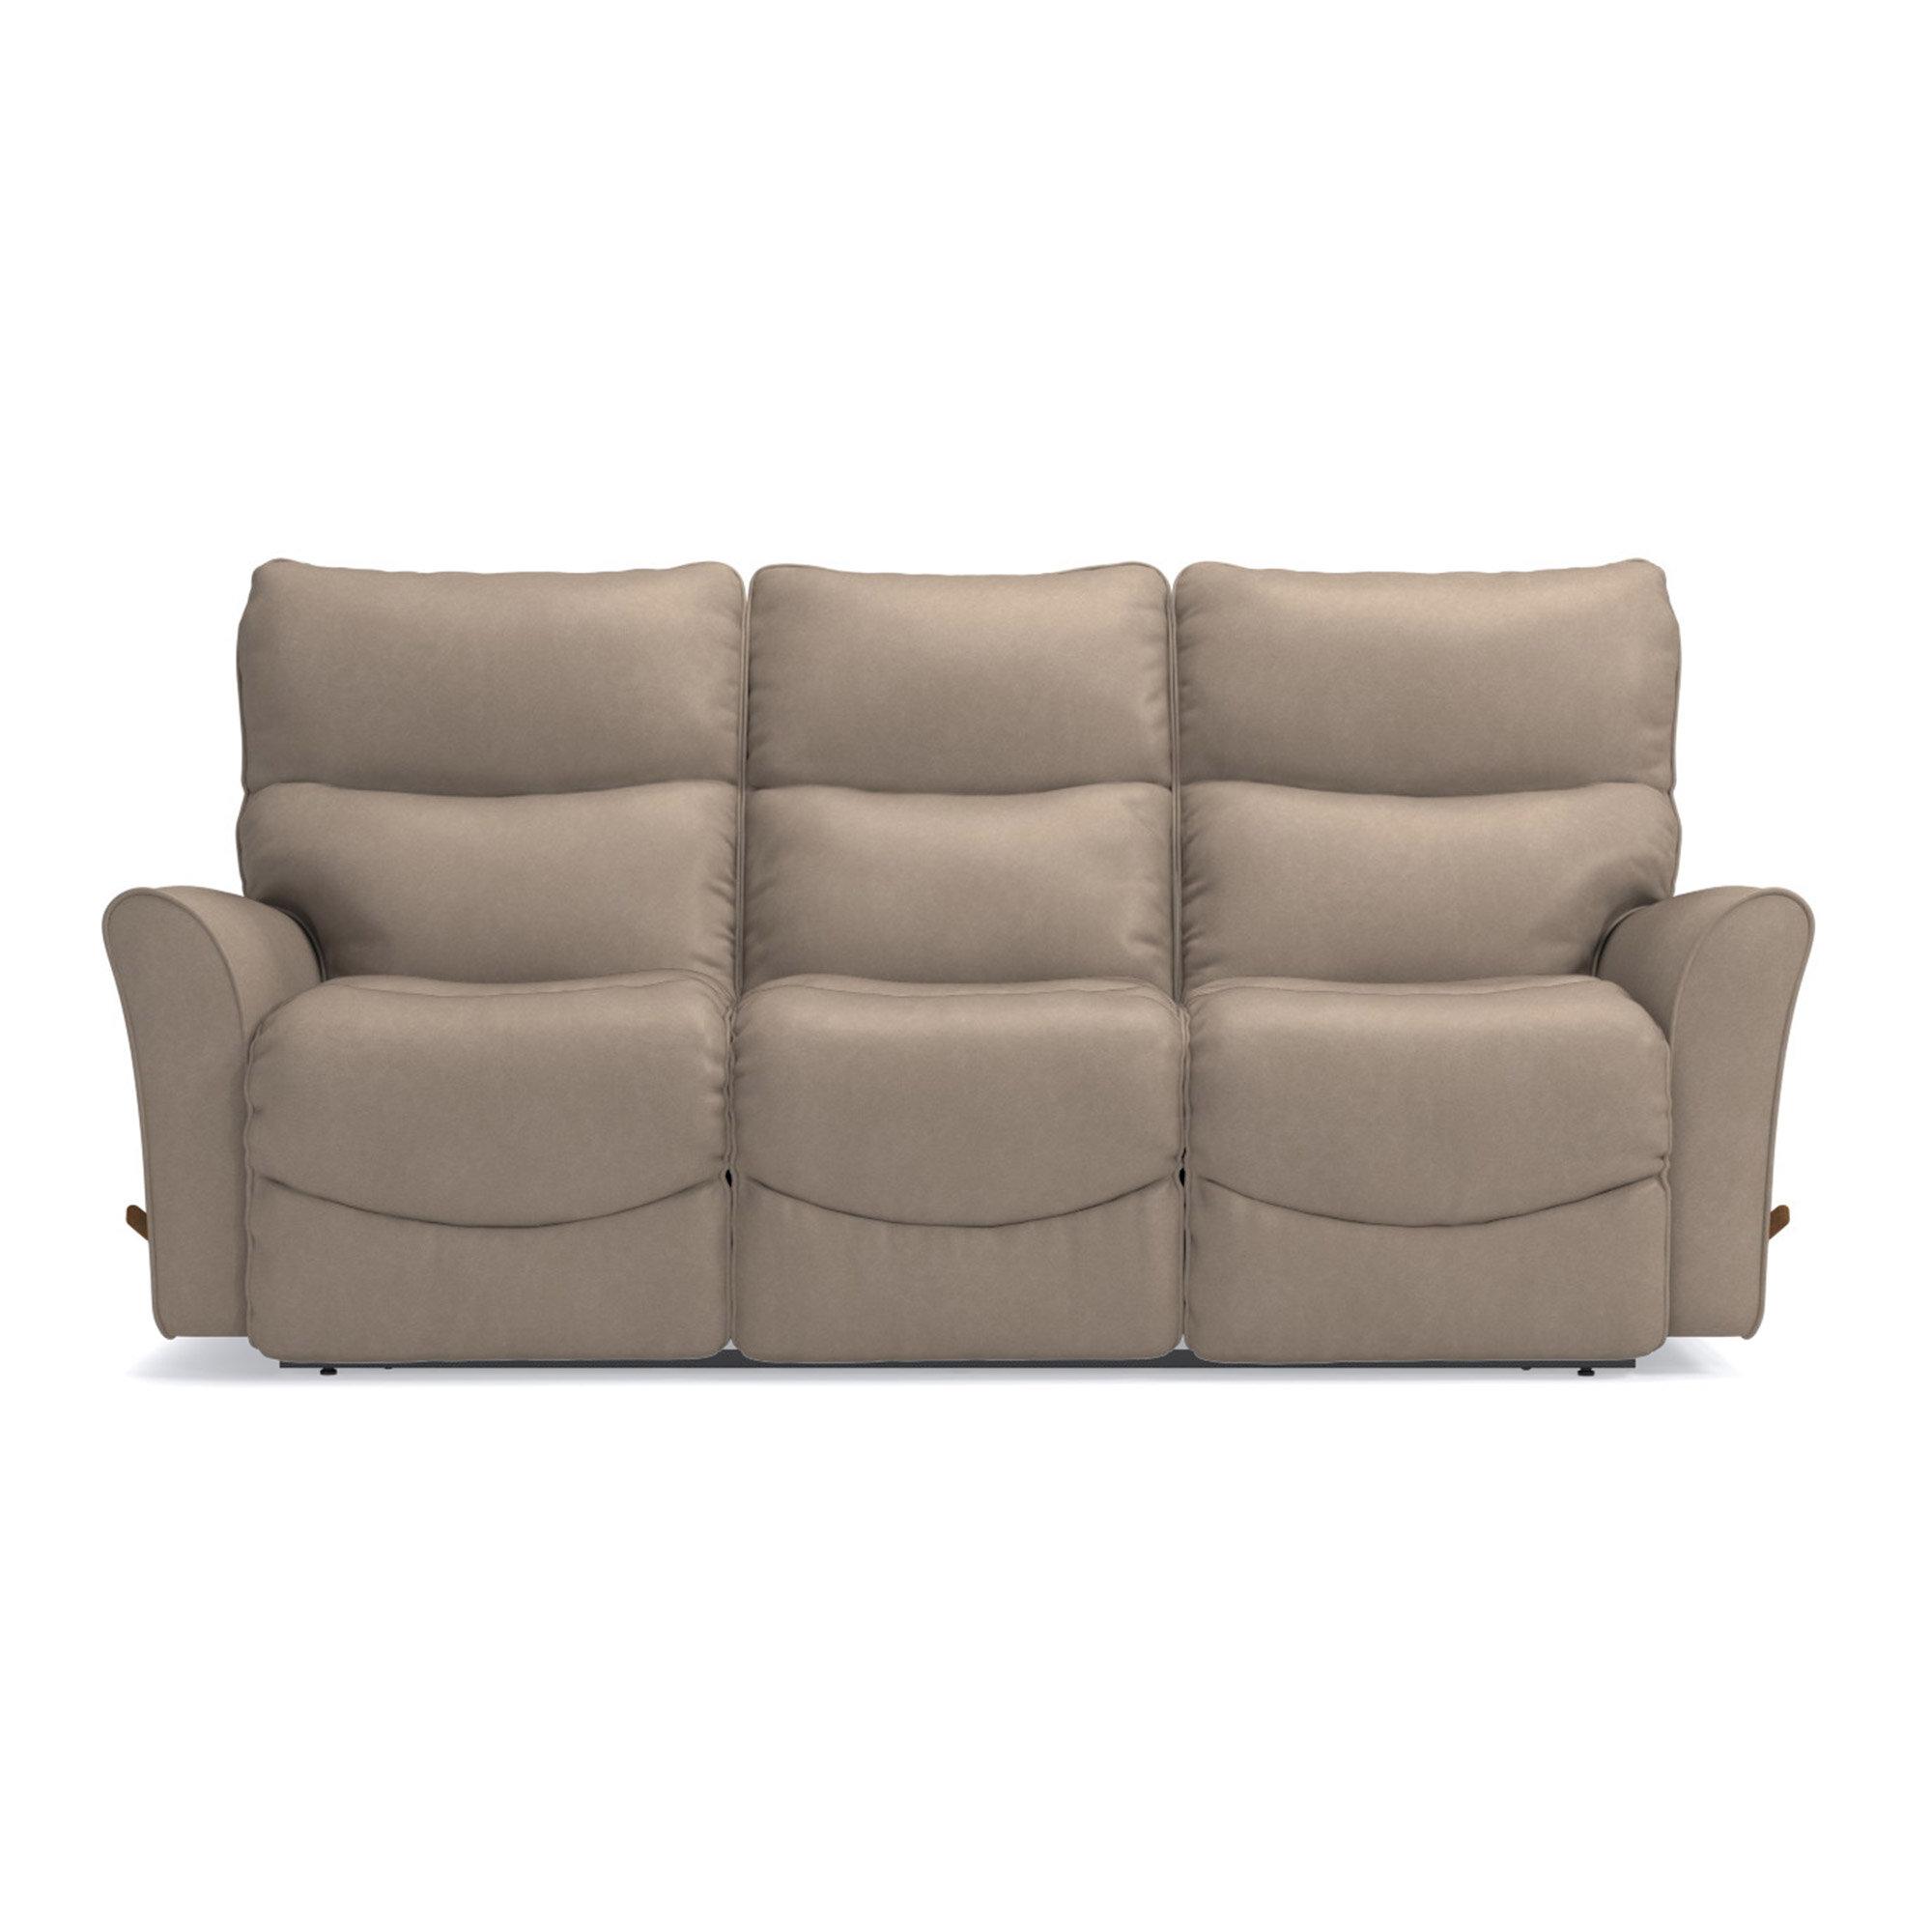 La-Z-Boy Rowan Leather Manual Reclining Sofa | Wayfair